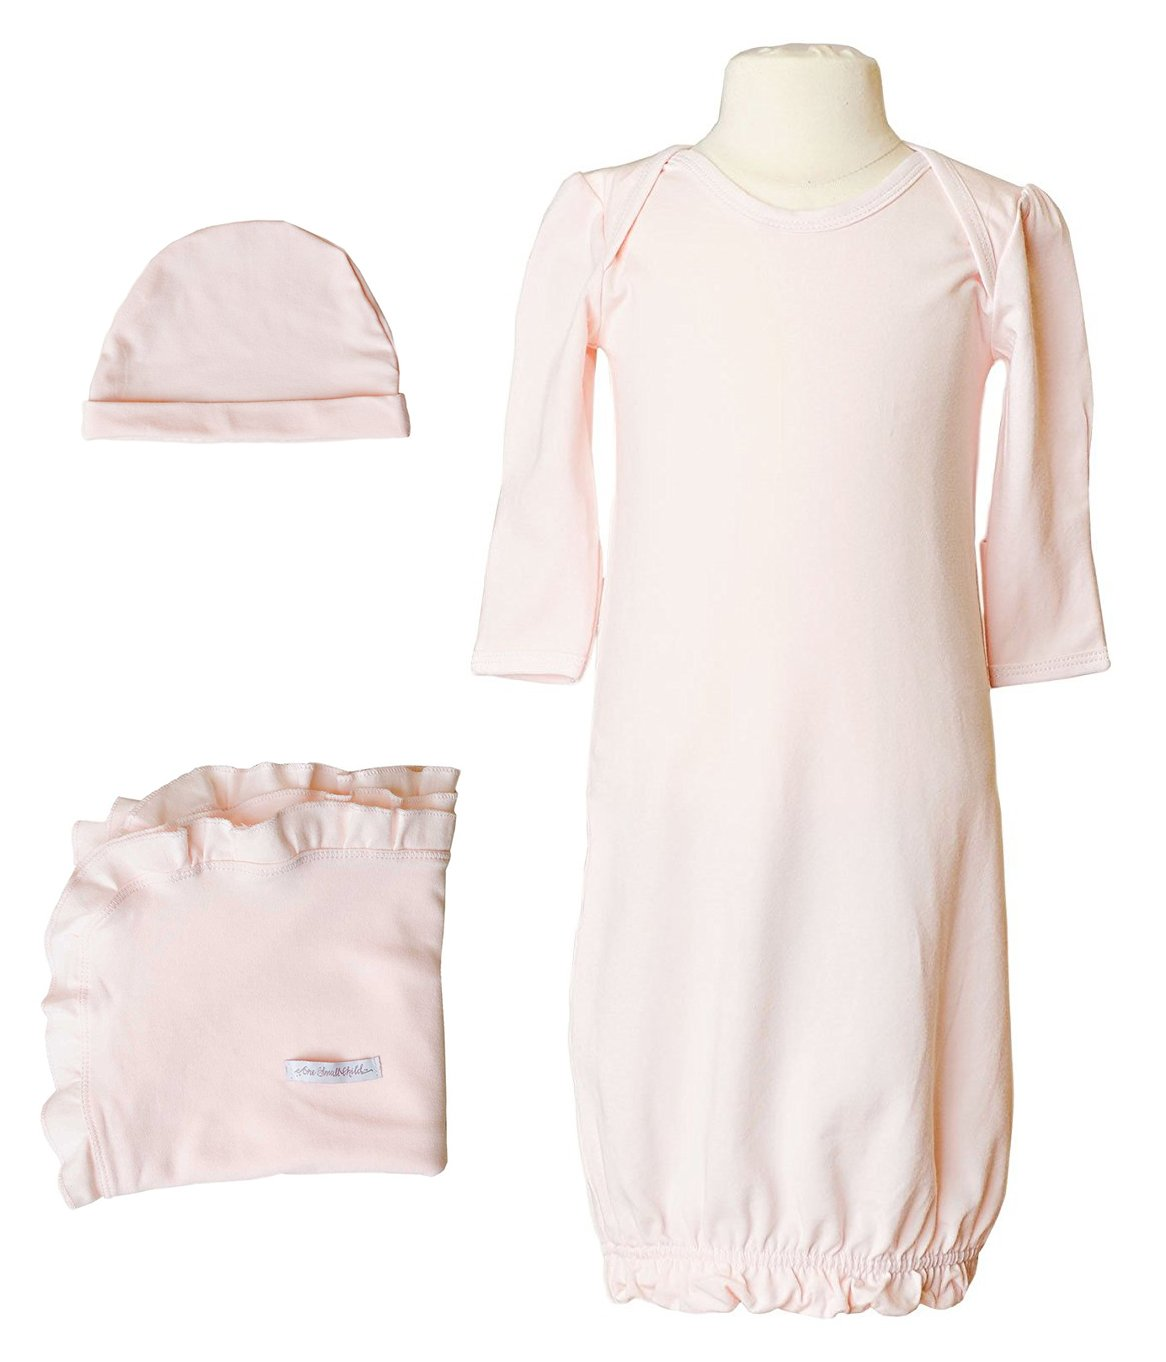 Girls Three-Piece Bamboo Layette Set (3-6 Months, Pink)